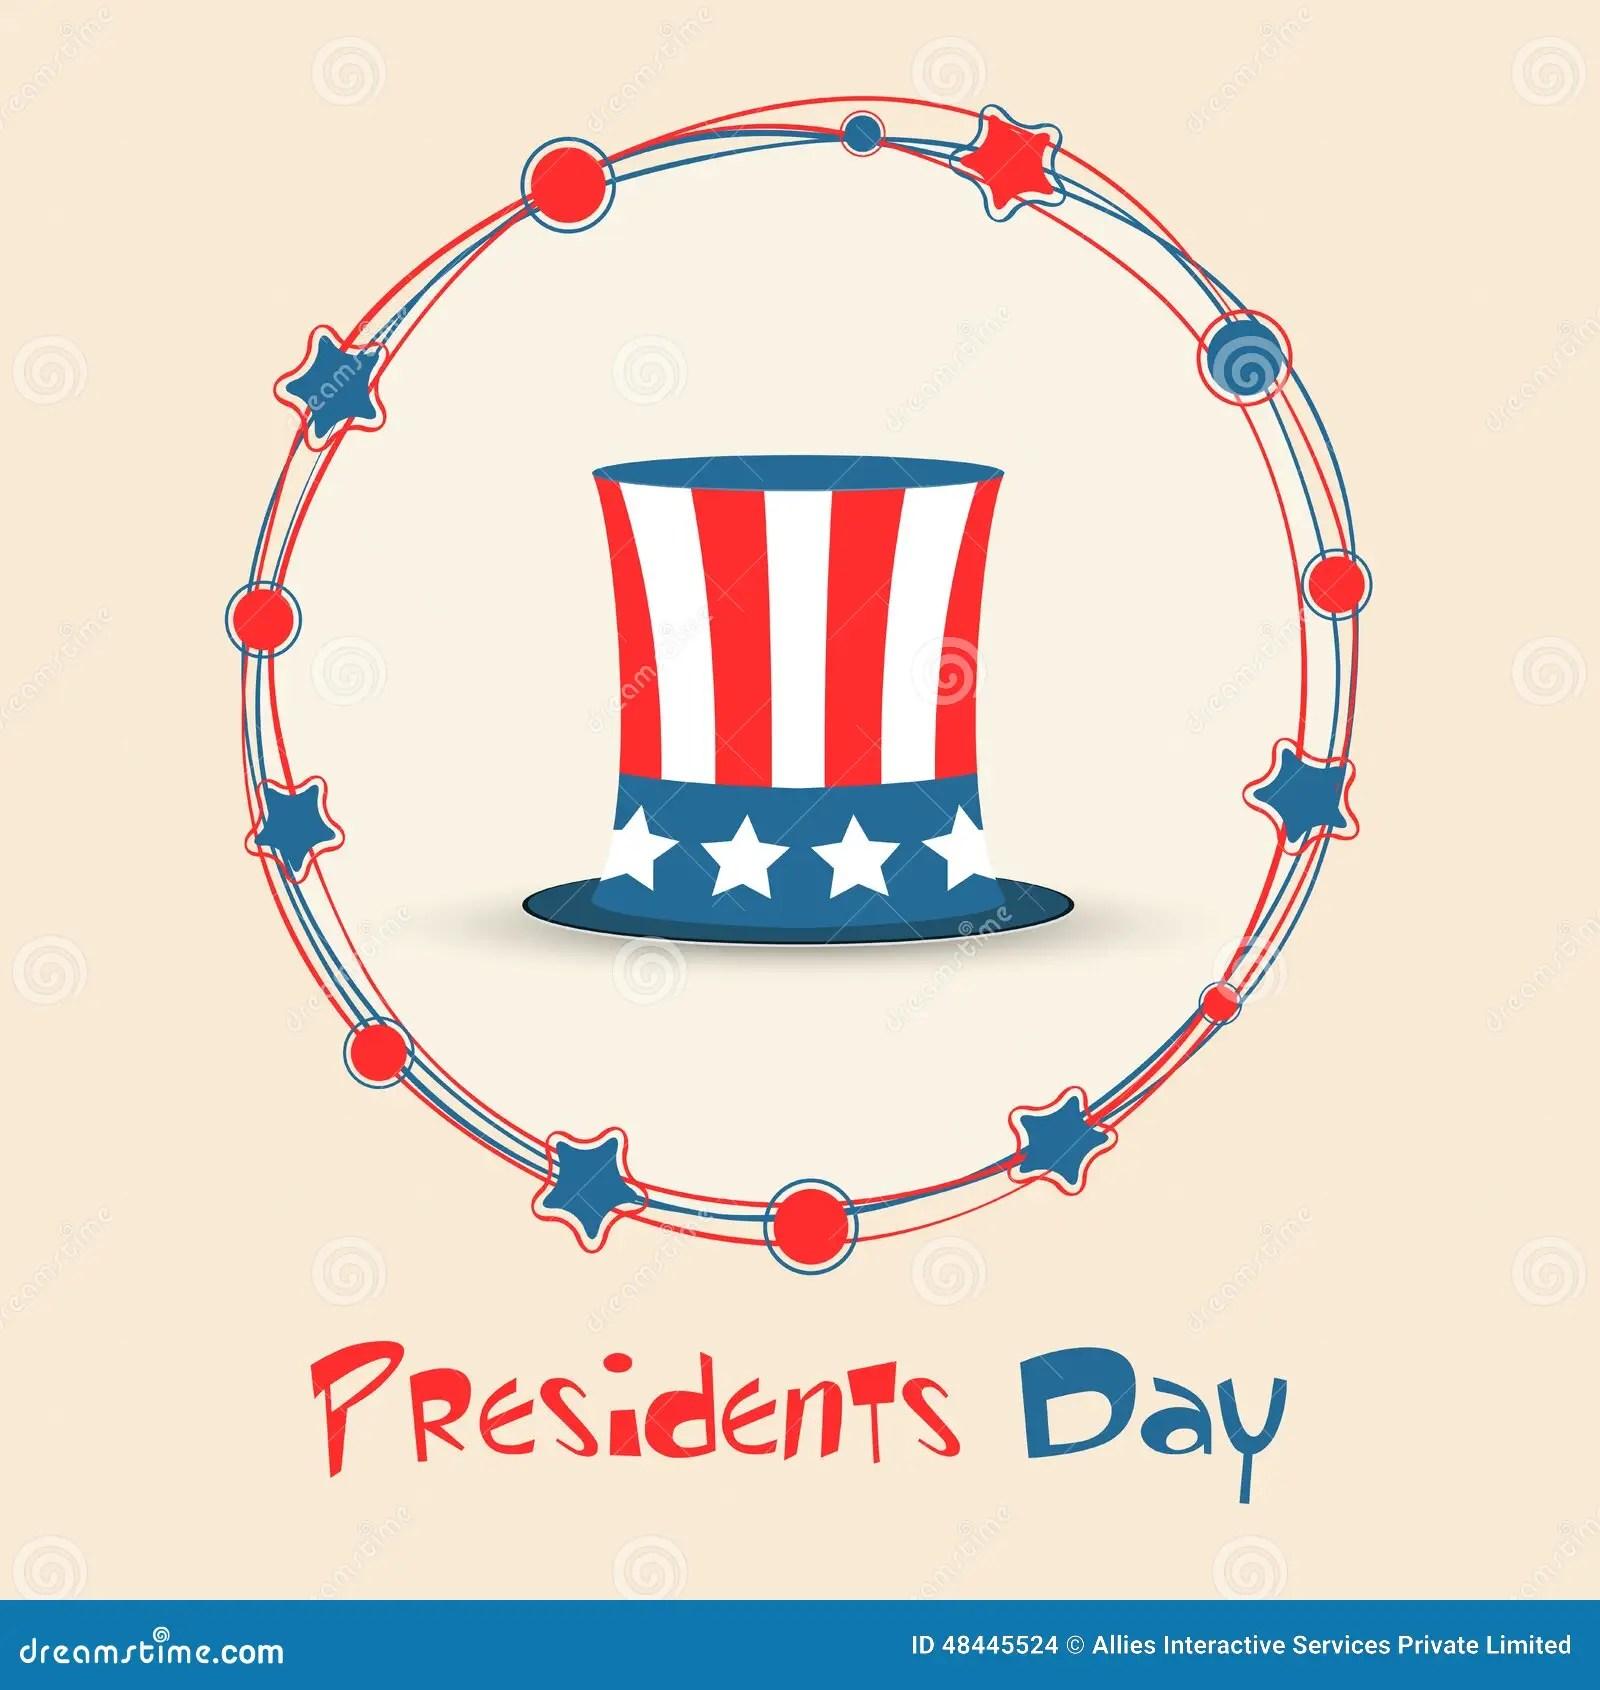 American Presidents Day Celebration Concept Stock